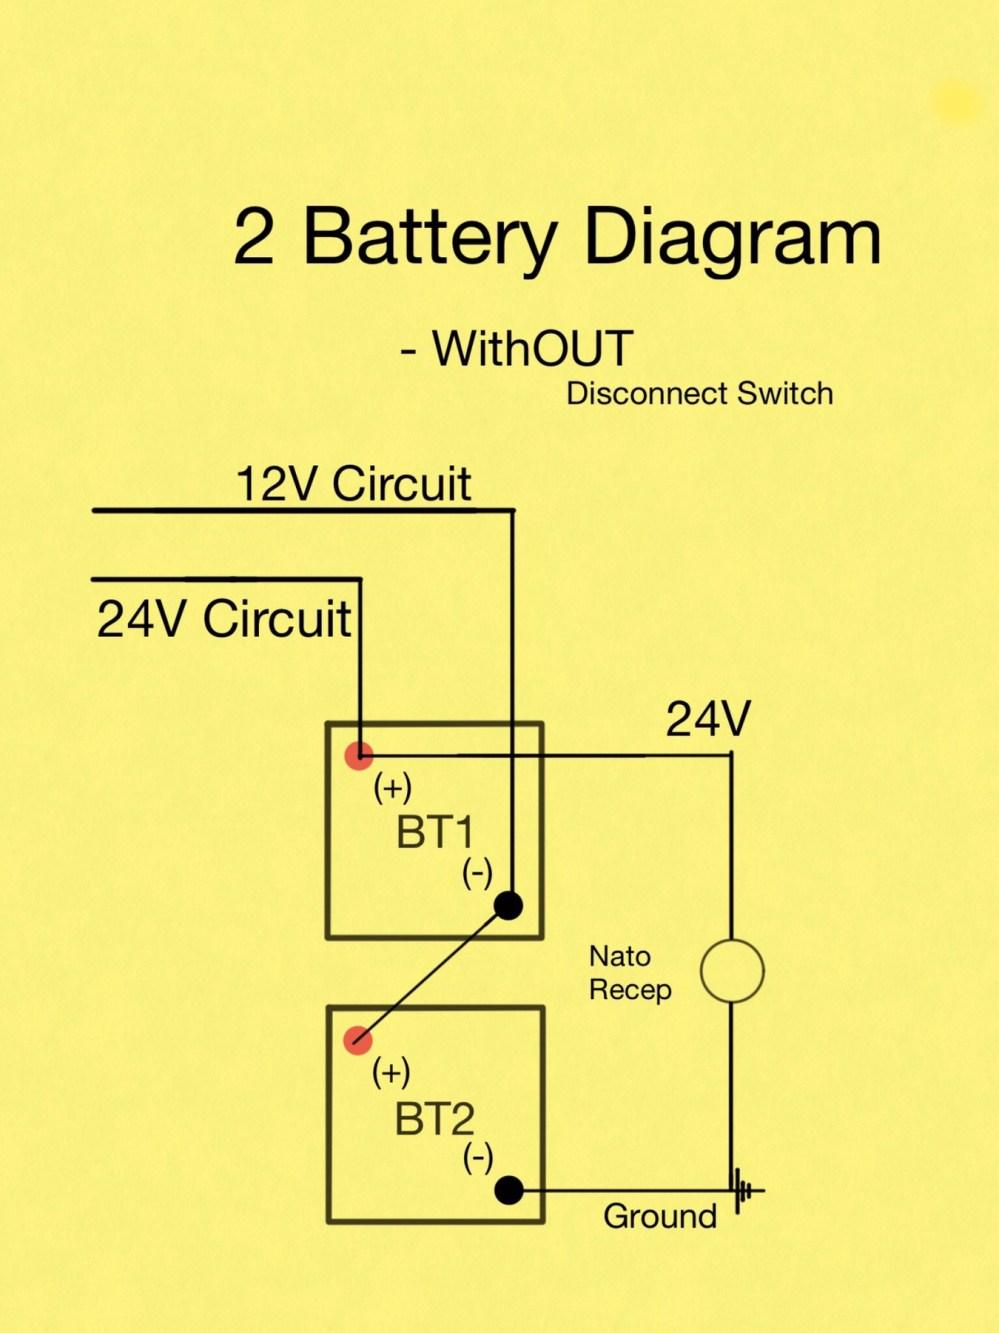 medium resolution of i did a new diagramhttps uploads tapatalk cdn com 201 f62f5c31d5 jpg